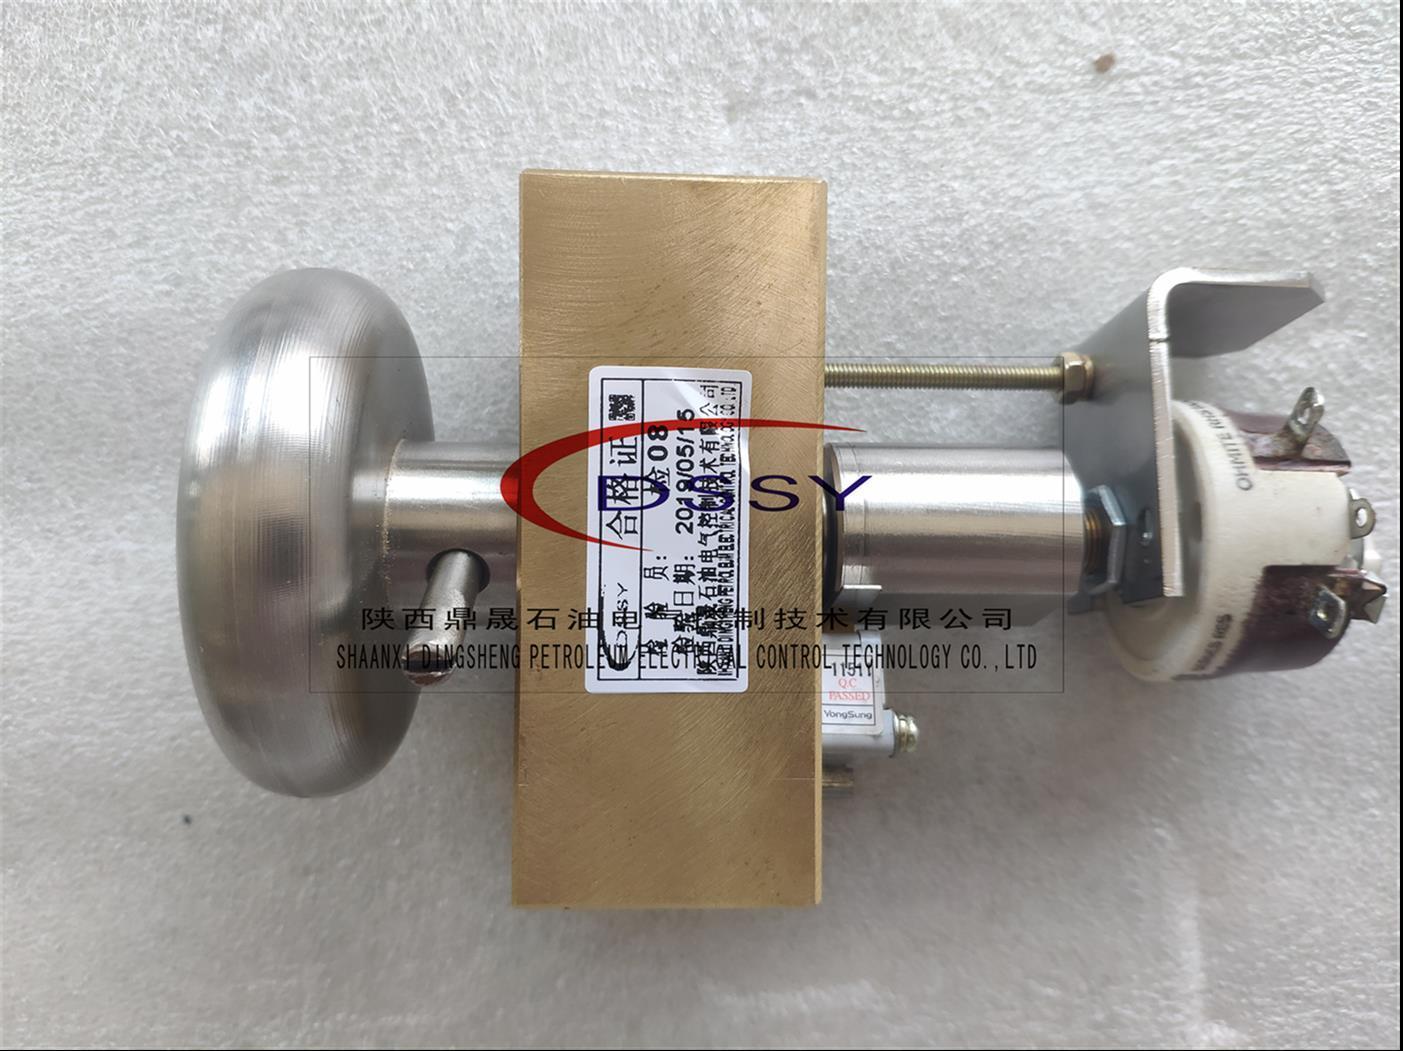 SCR电控房手轮总成单联0201-0906-0001-00